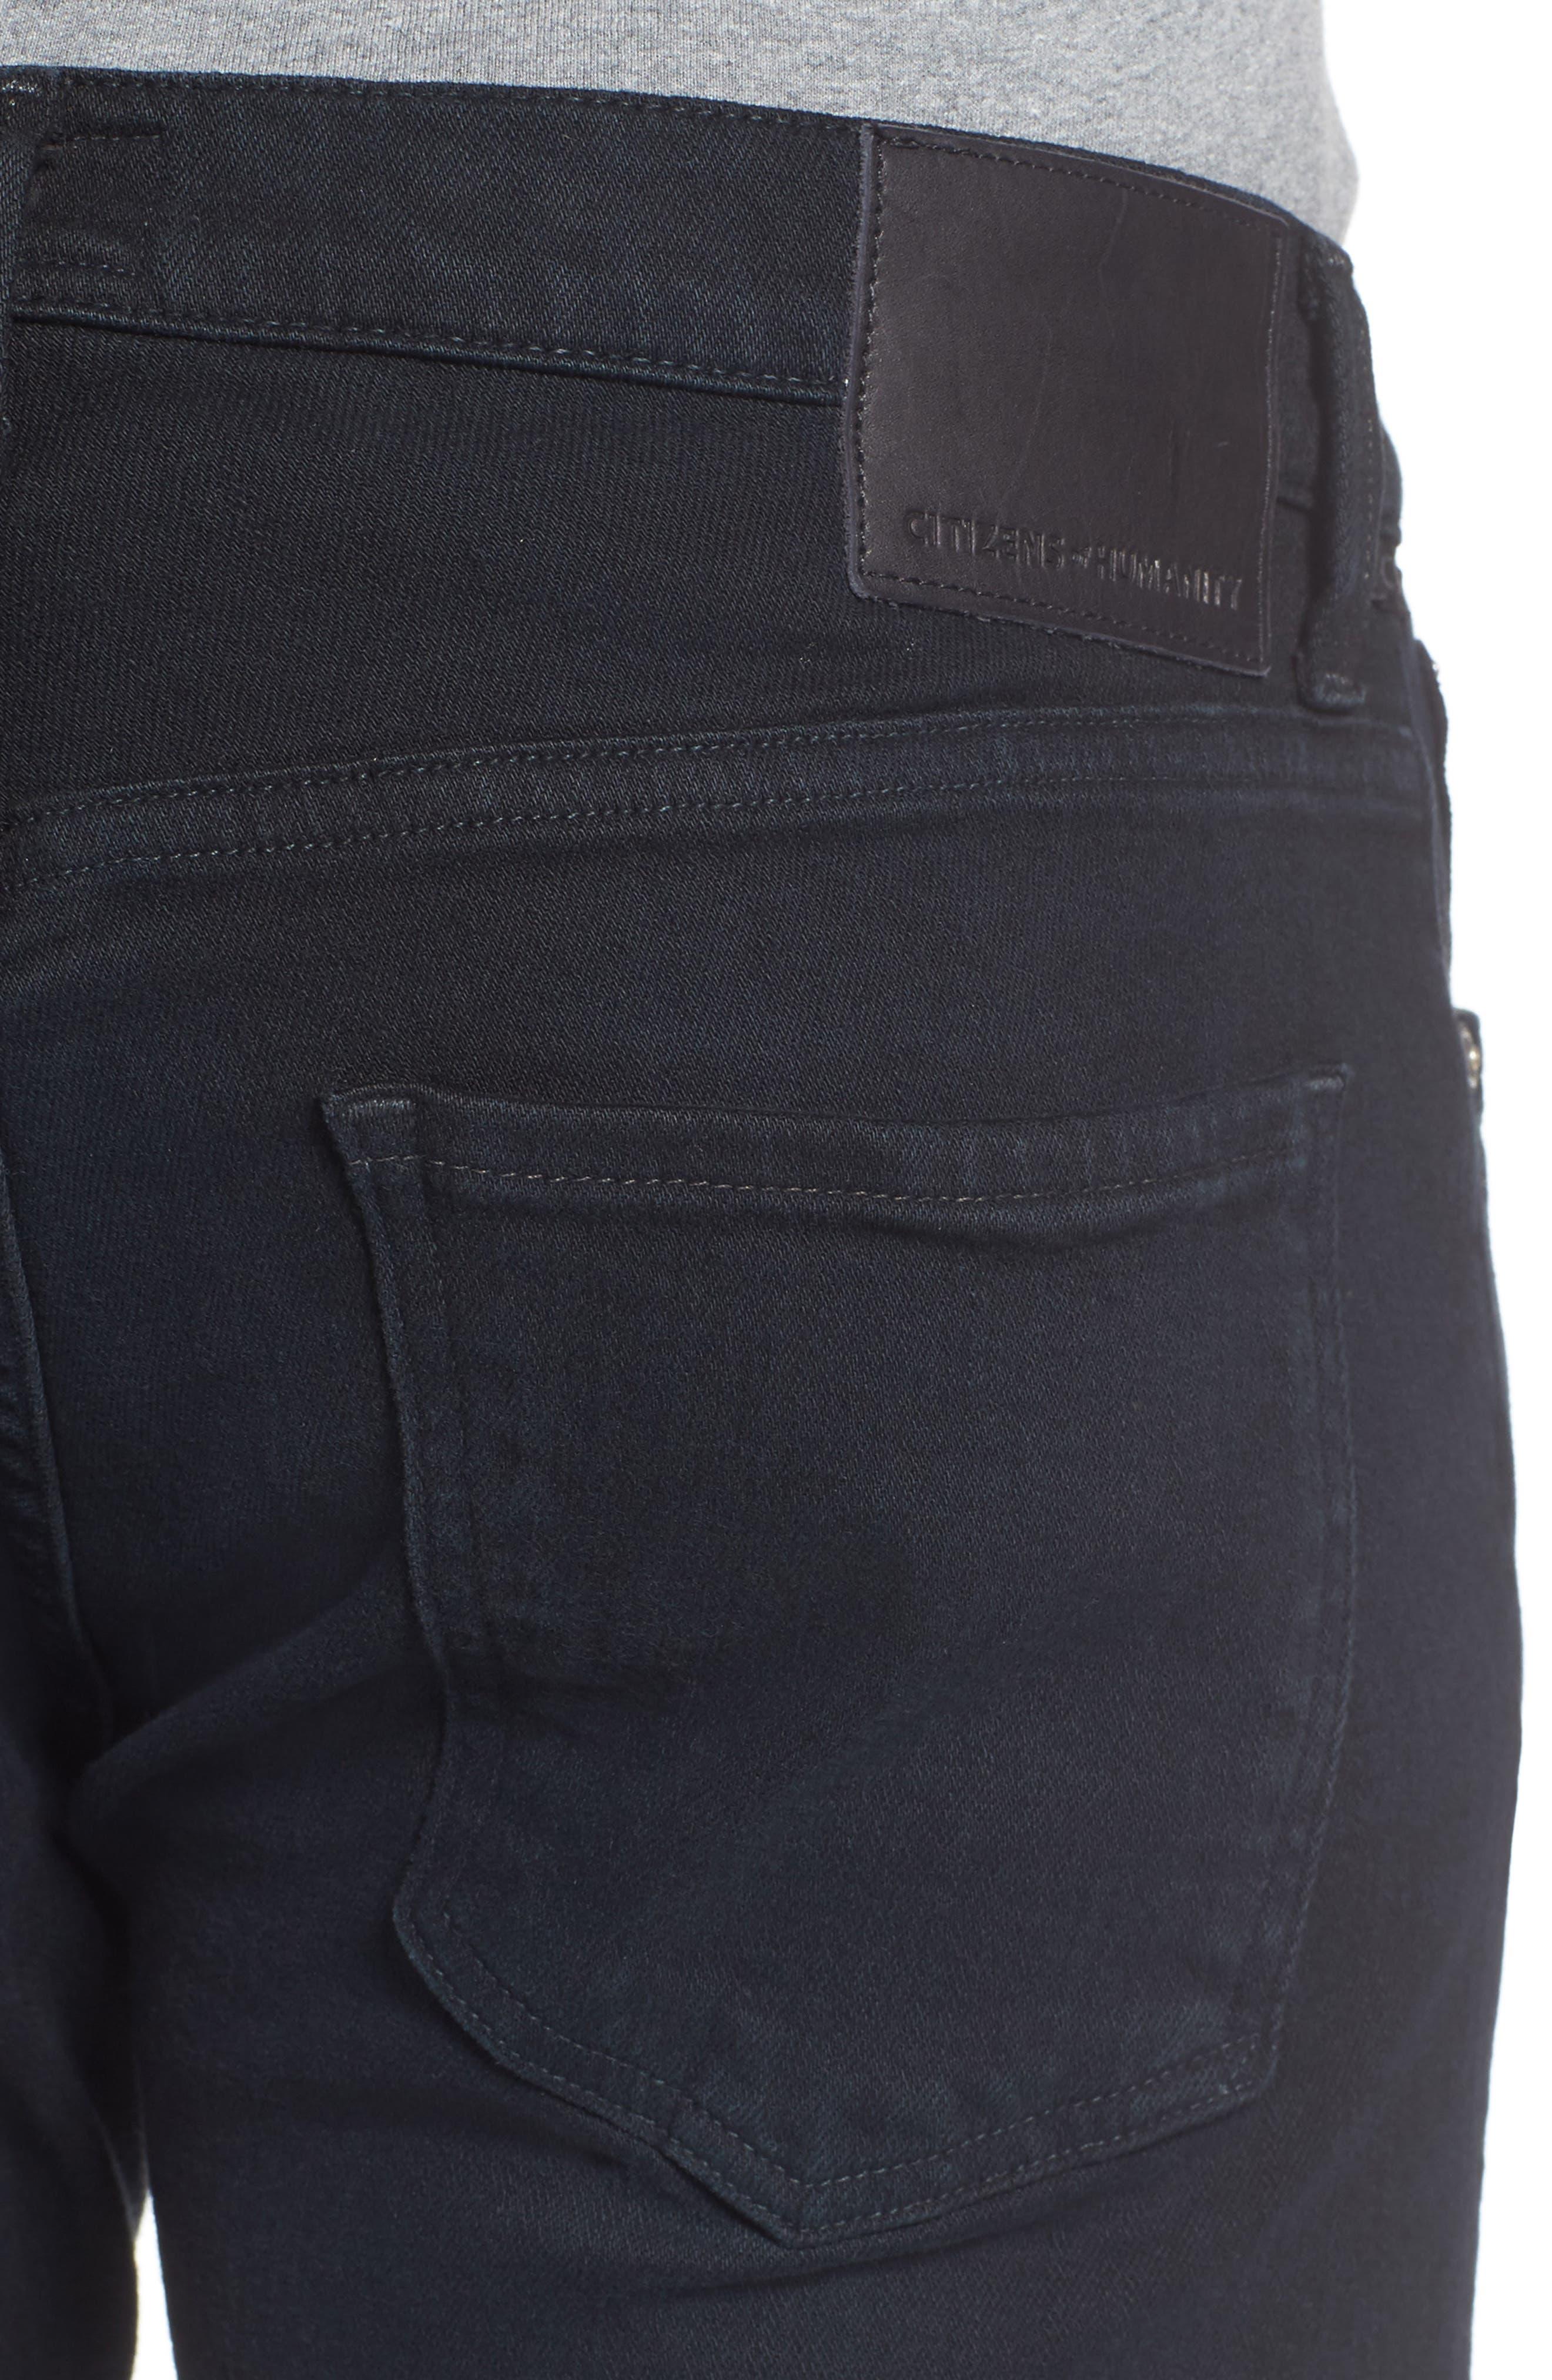 Gage Slim Straight Leg Jeans,                             Alternate thumbnail 4, color,                             401